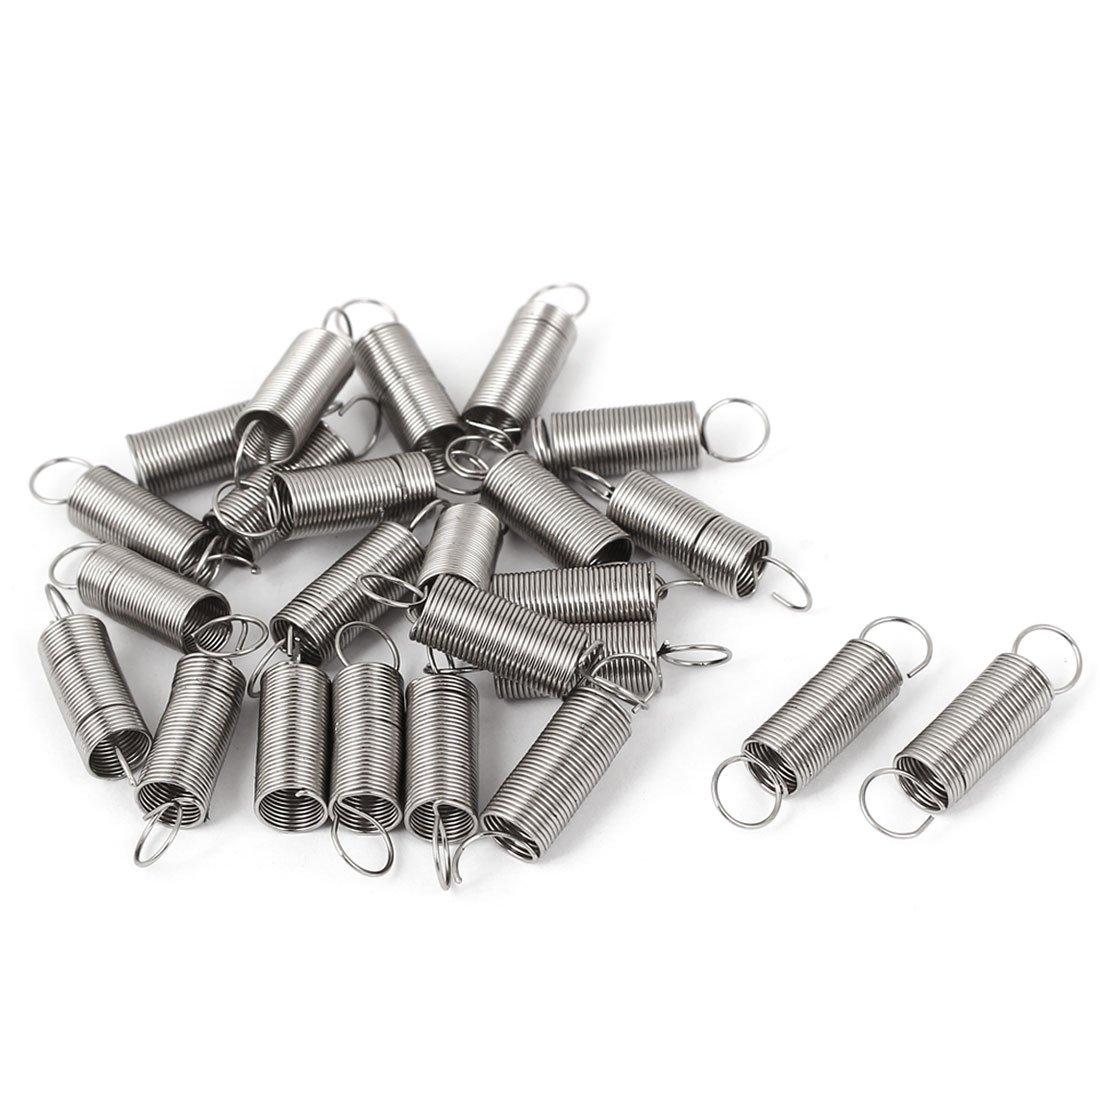 0.4mmx4.5x12mm Metal Dual Hook Small Tension Spring 50 pcs